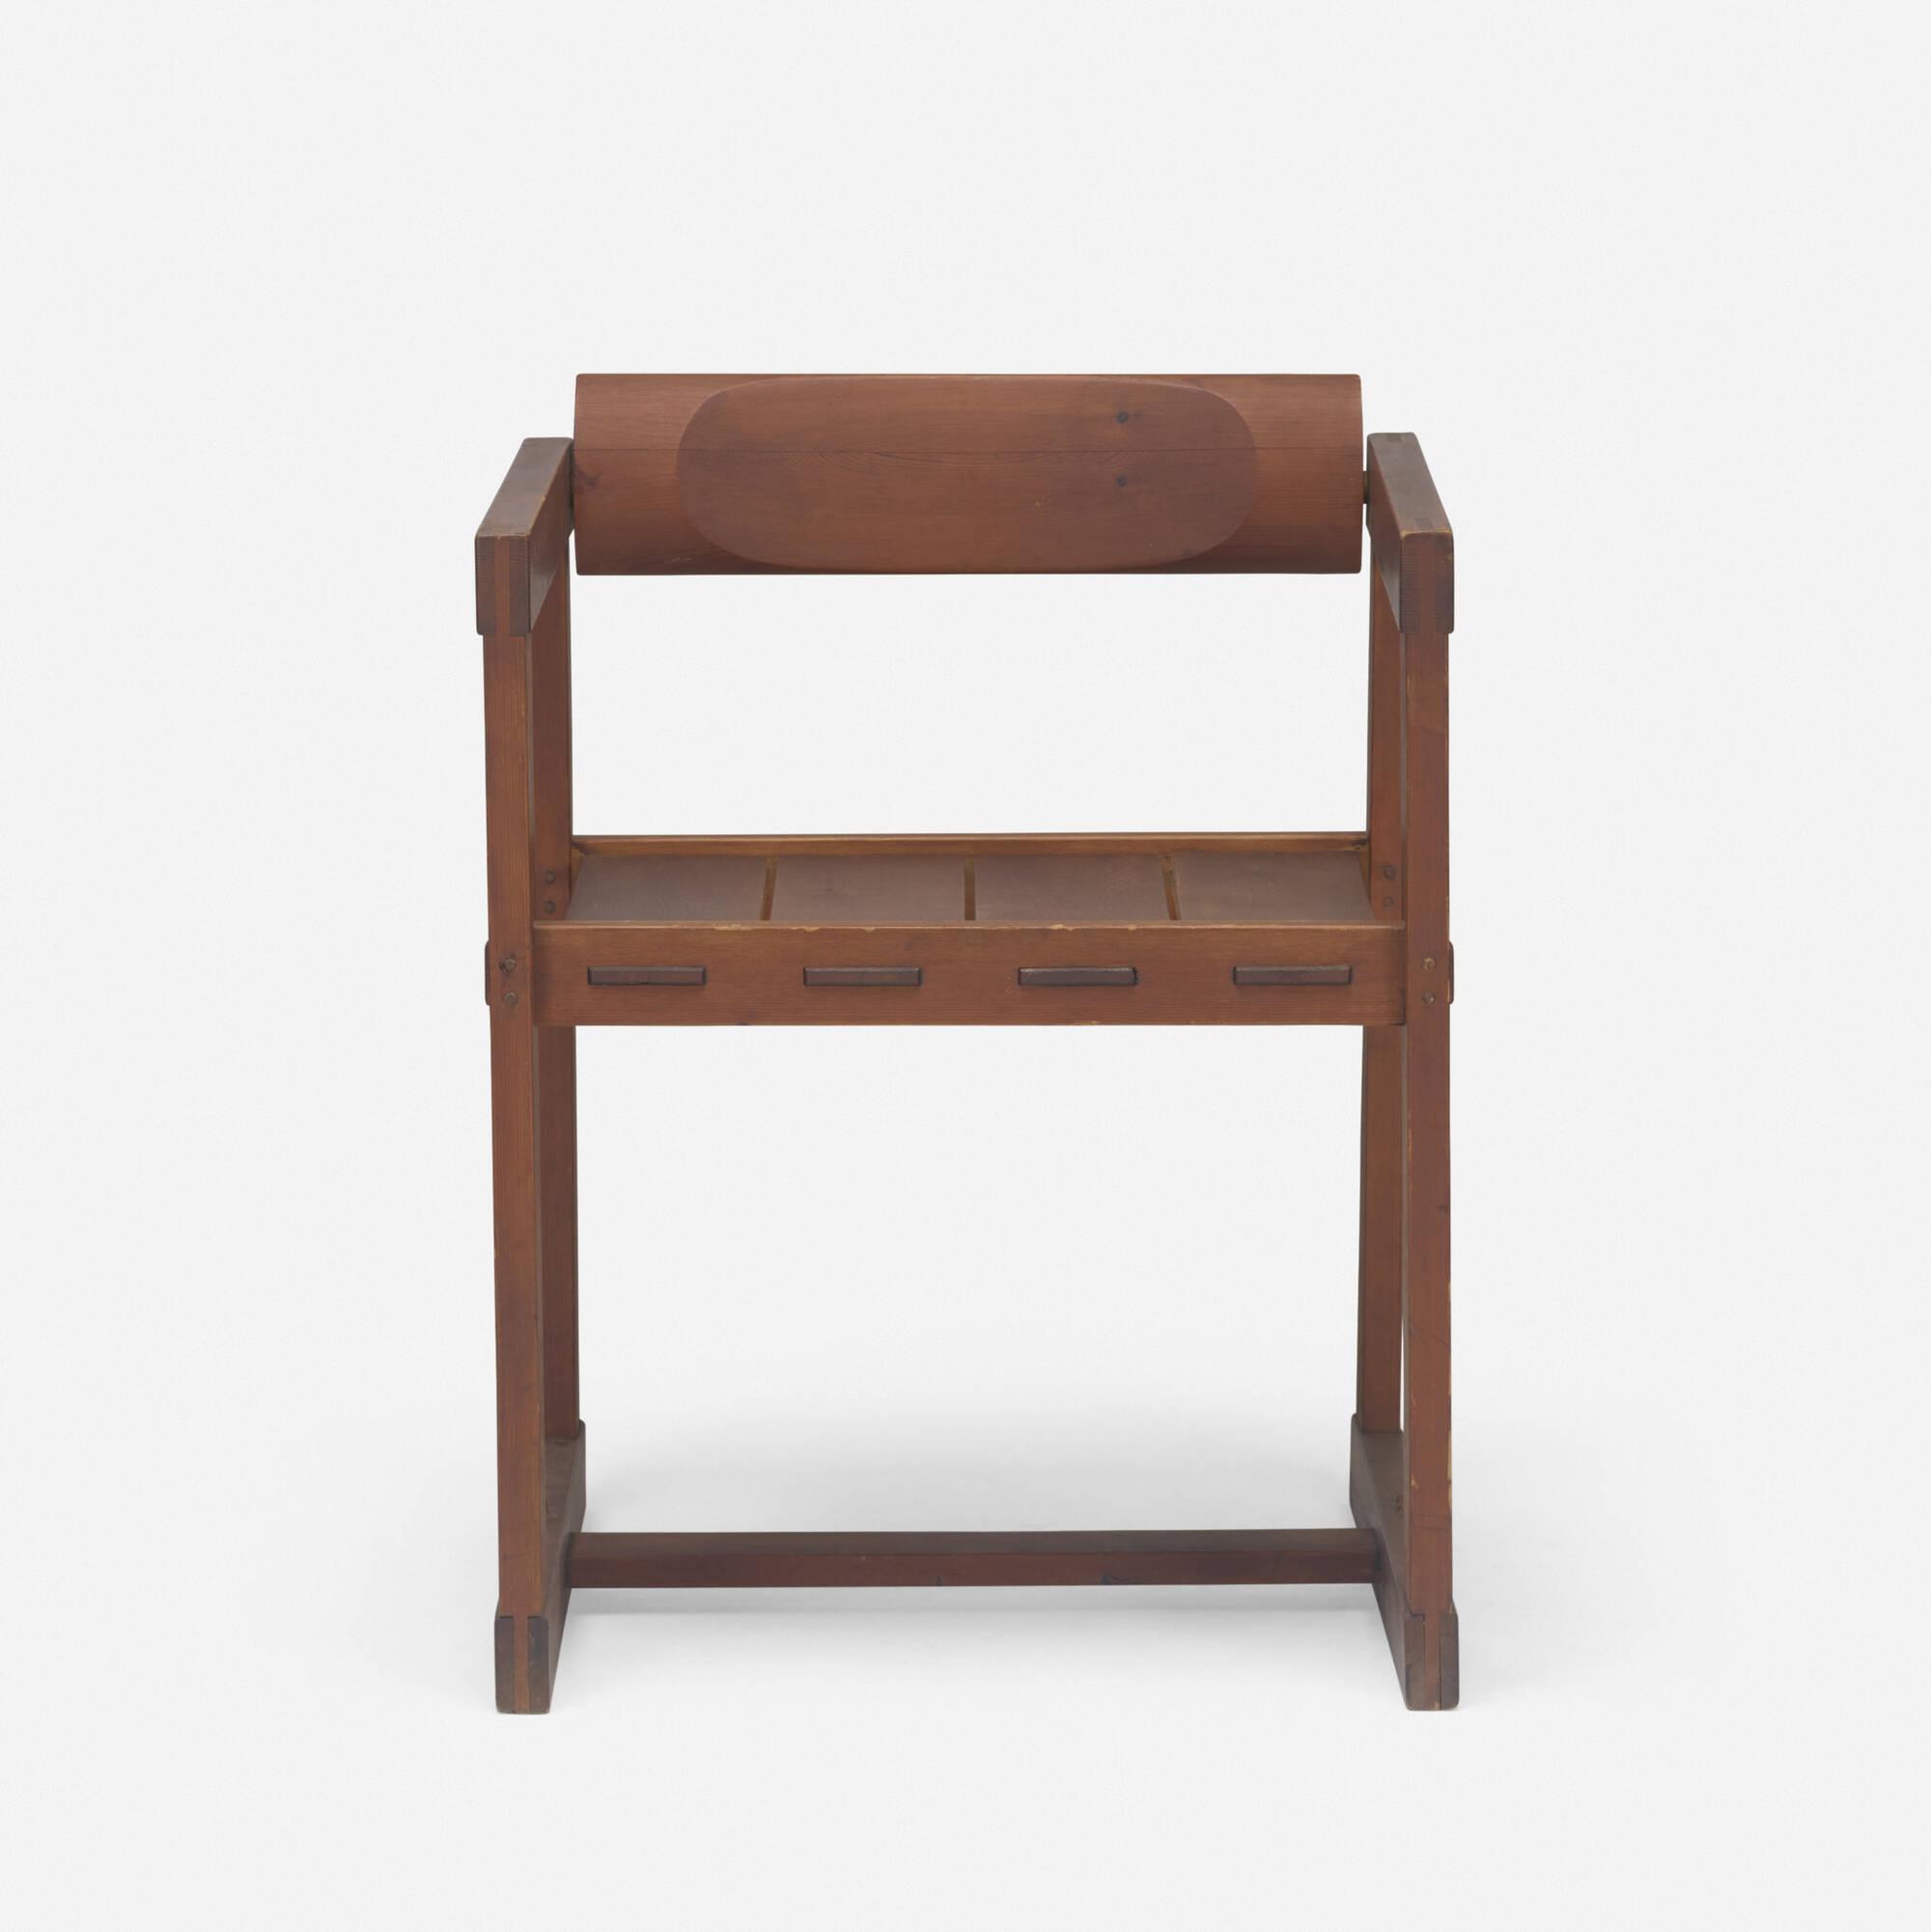 142: Edwin Helseth / Tybo armchair (2 of 3)